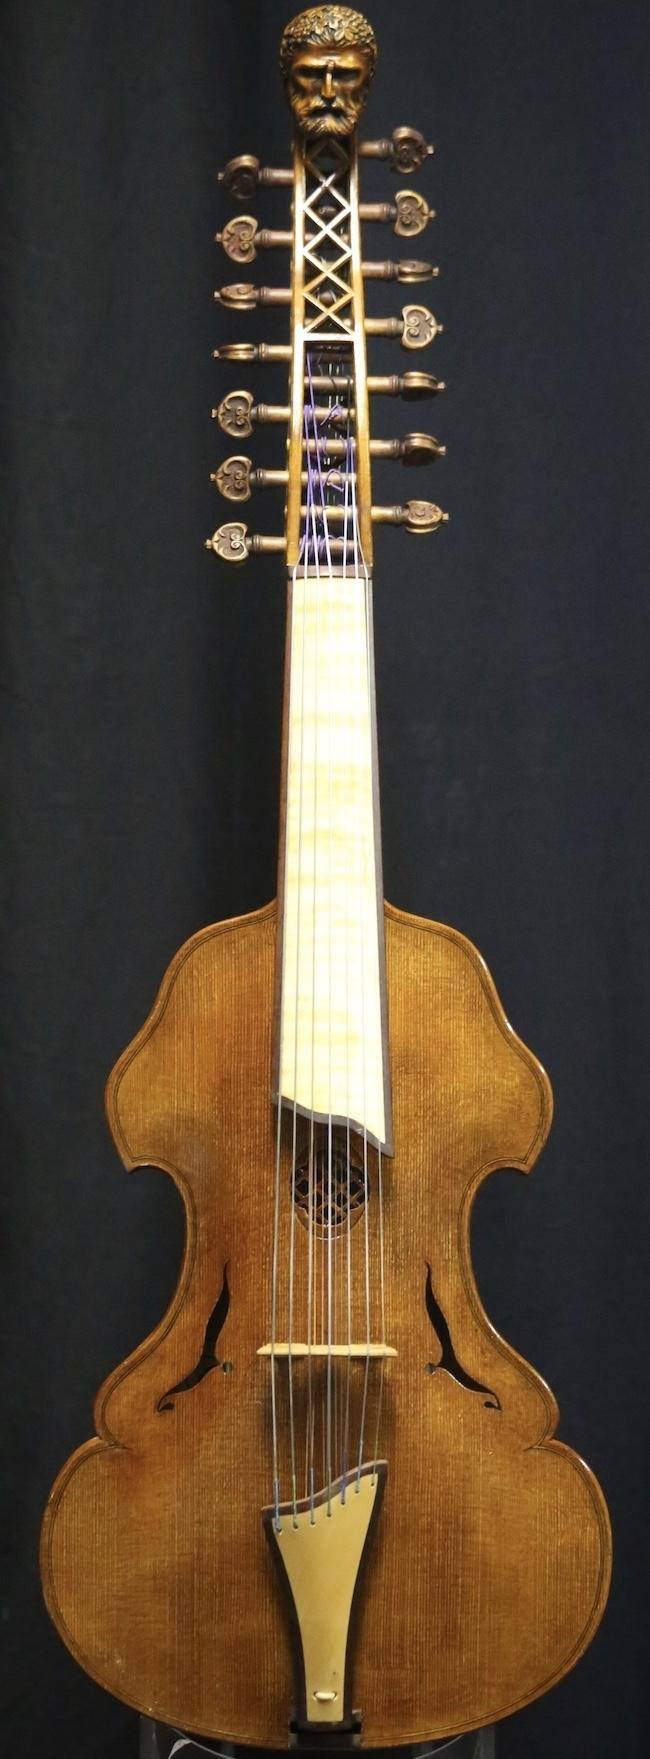 fine violas for sale italian violas circa 1997 hans nancy and eric benning viola d 39 amore. Black Bedroom Furniture Sets. Home Design Ideas